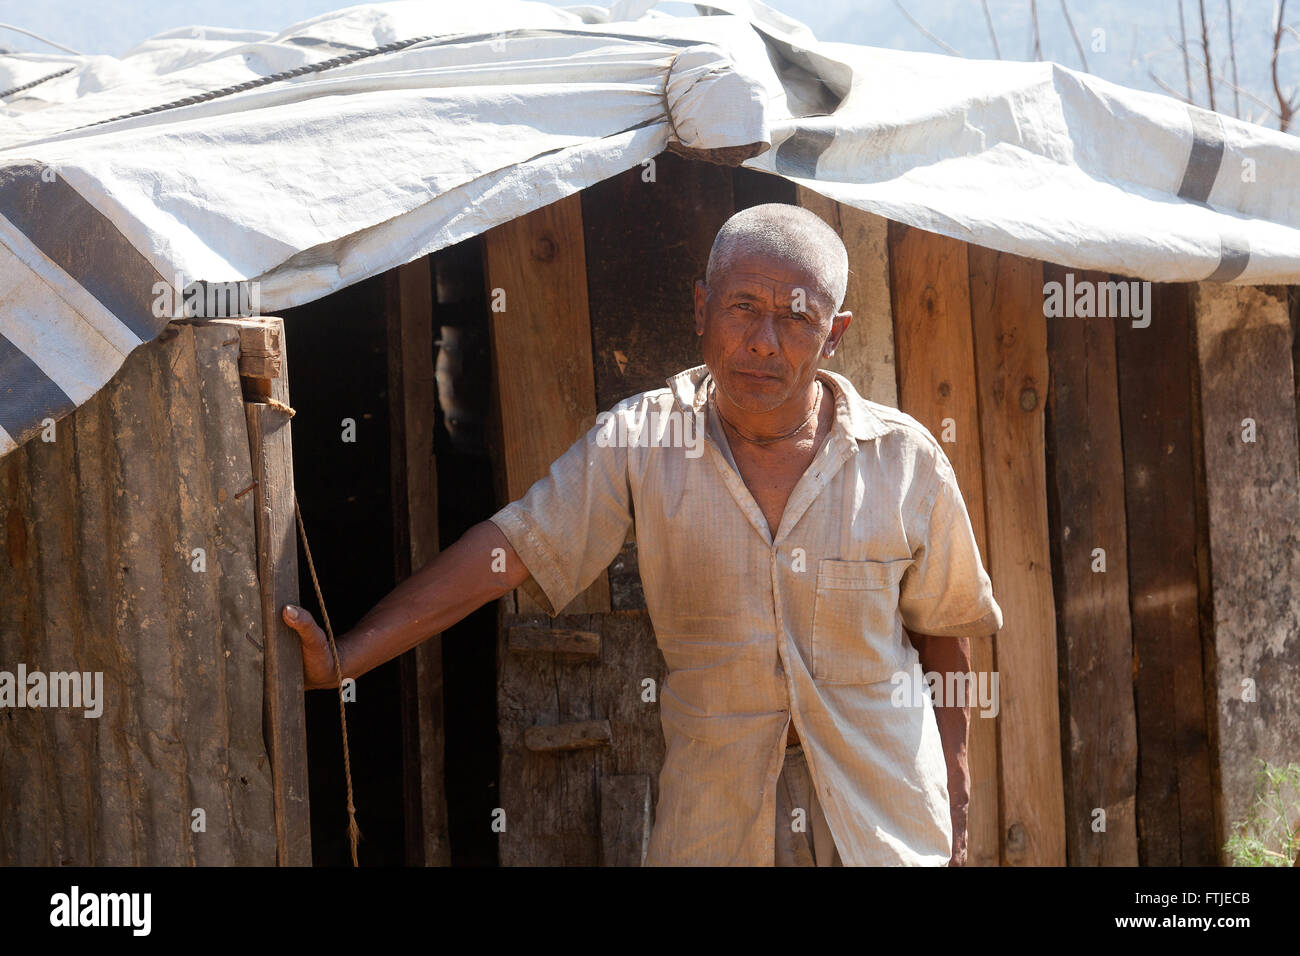 Nil Bahadur Napit (69) outside his shelter in Phataksila, Sindhupalchowk, Nepal - Stock Image